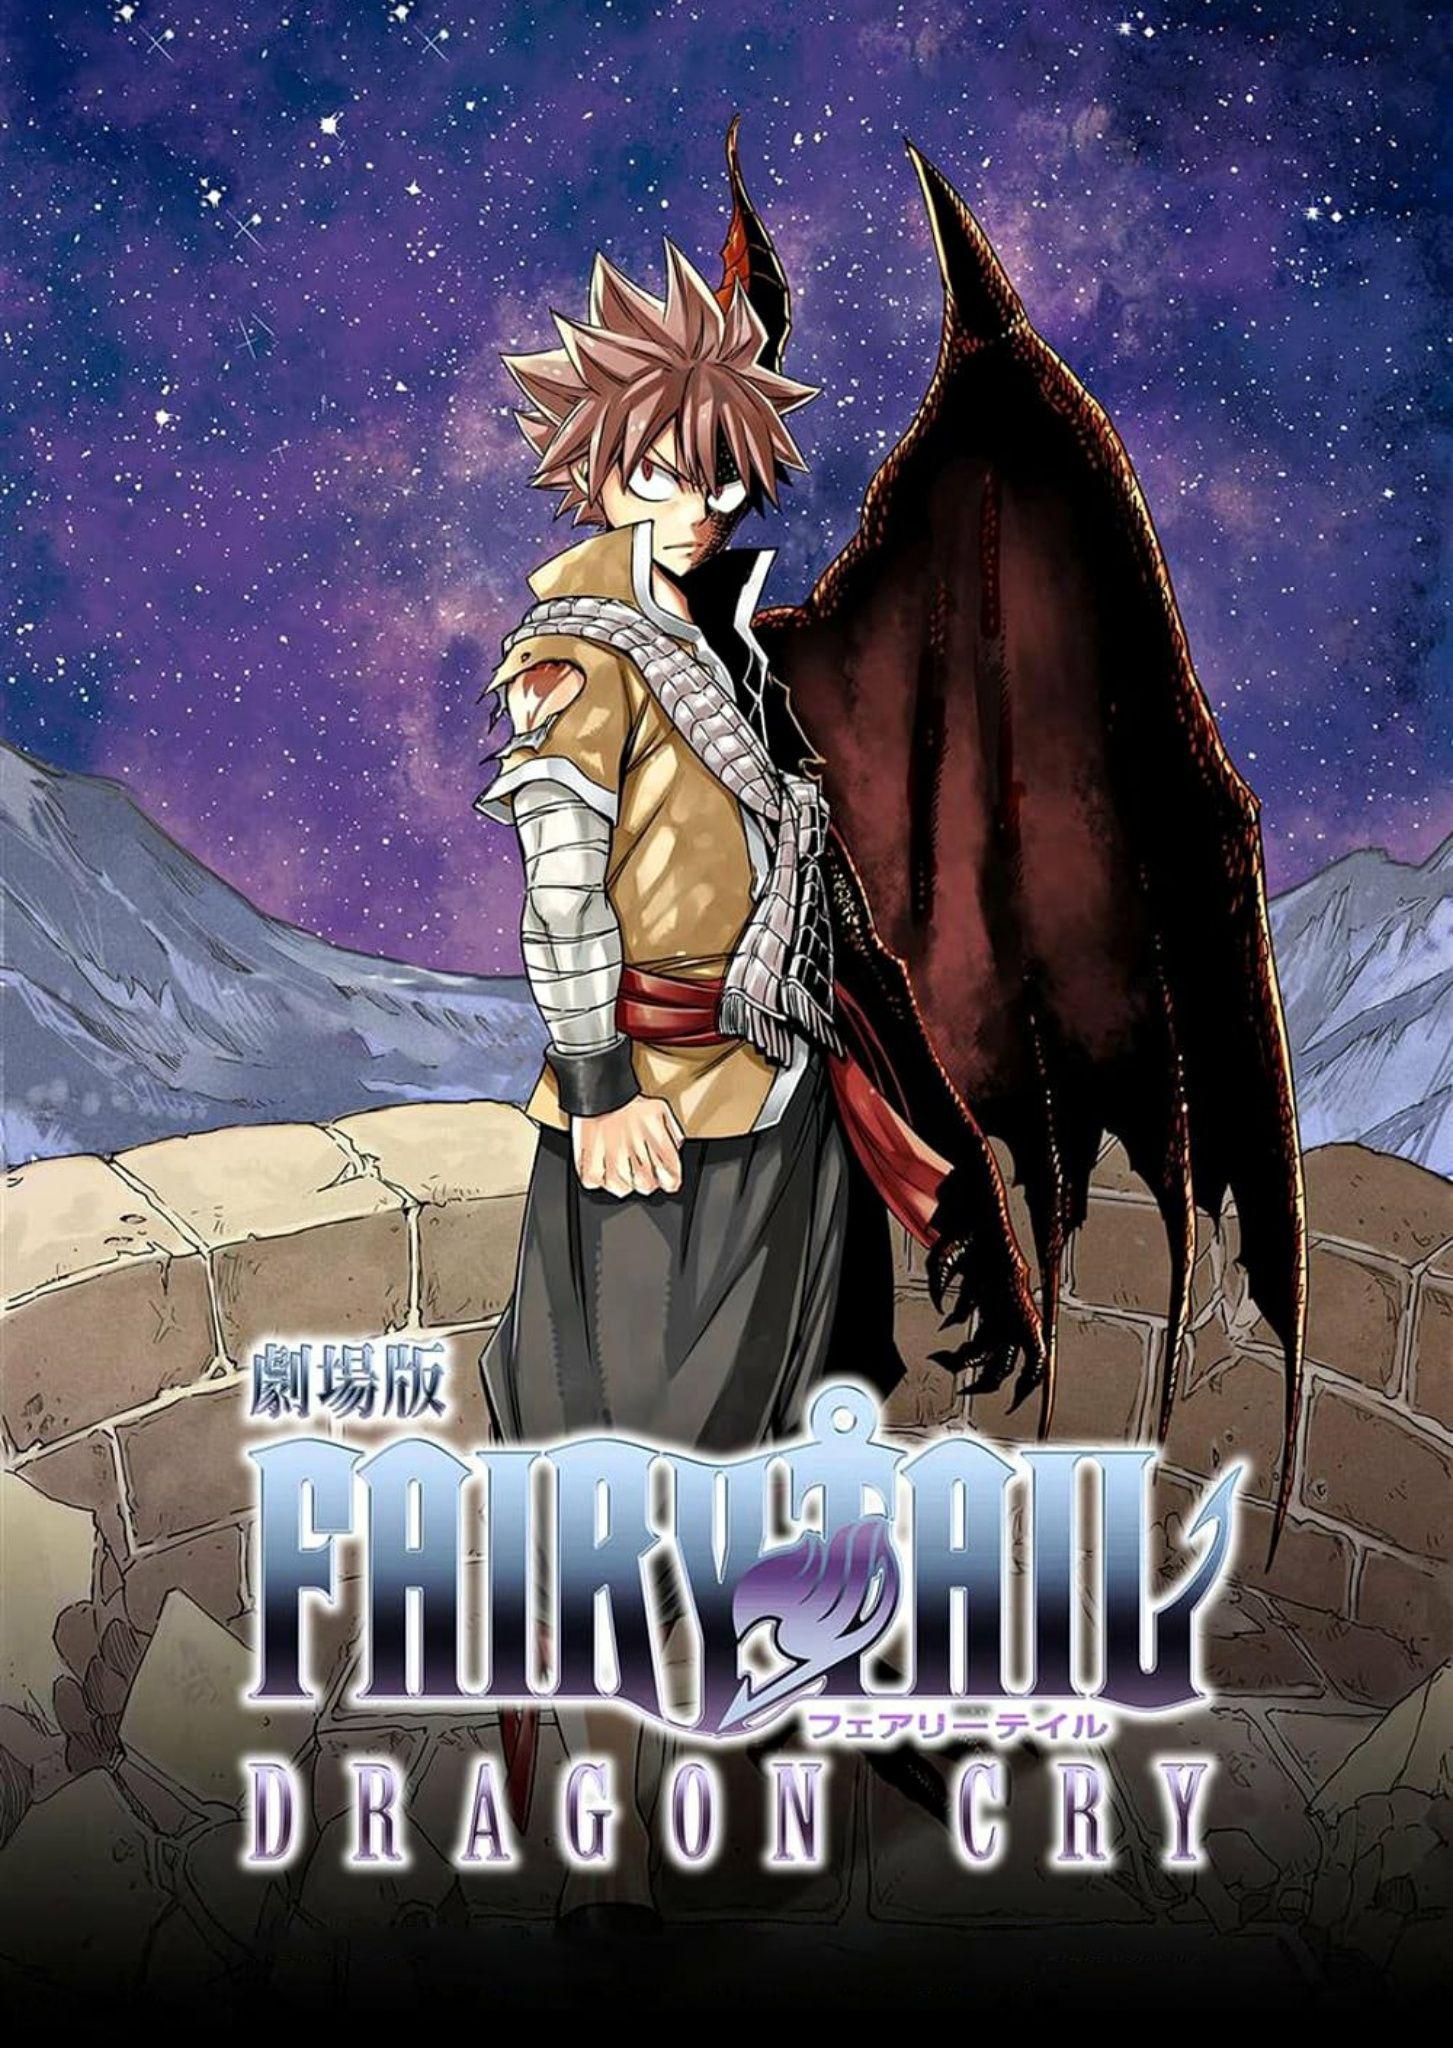 Pin de AnimeL MG en AnimeL MG Anime Fairytail